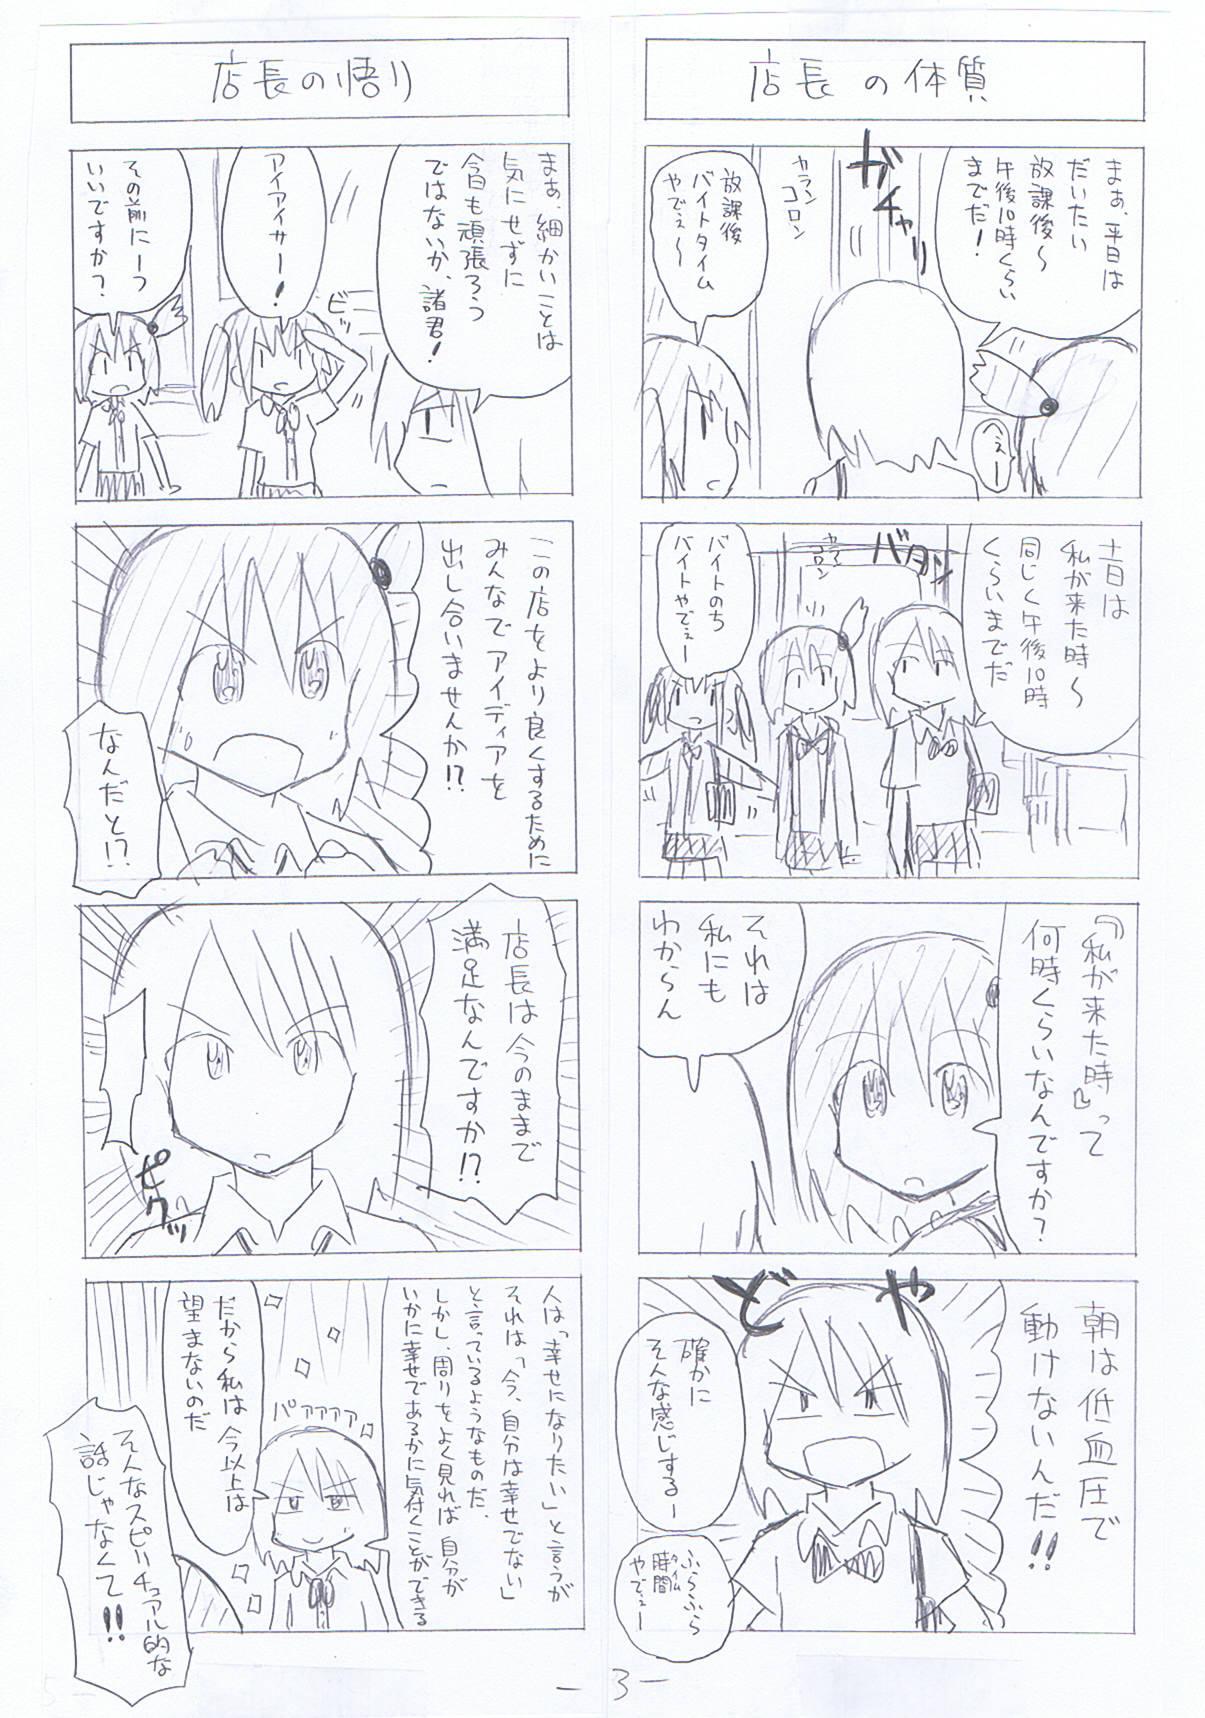 hitotoki-2-3.jpg